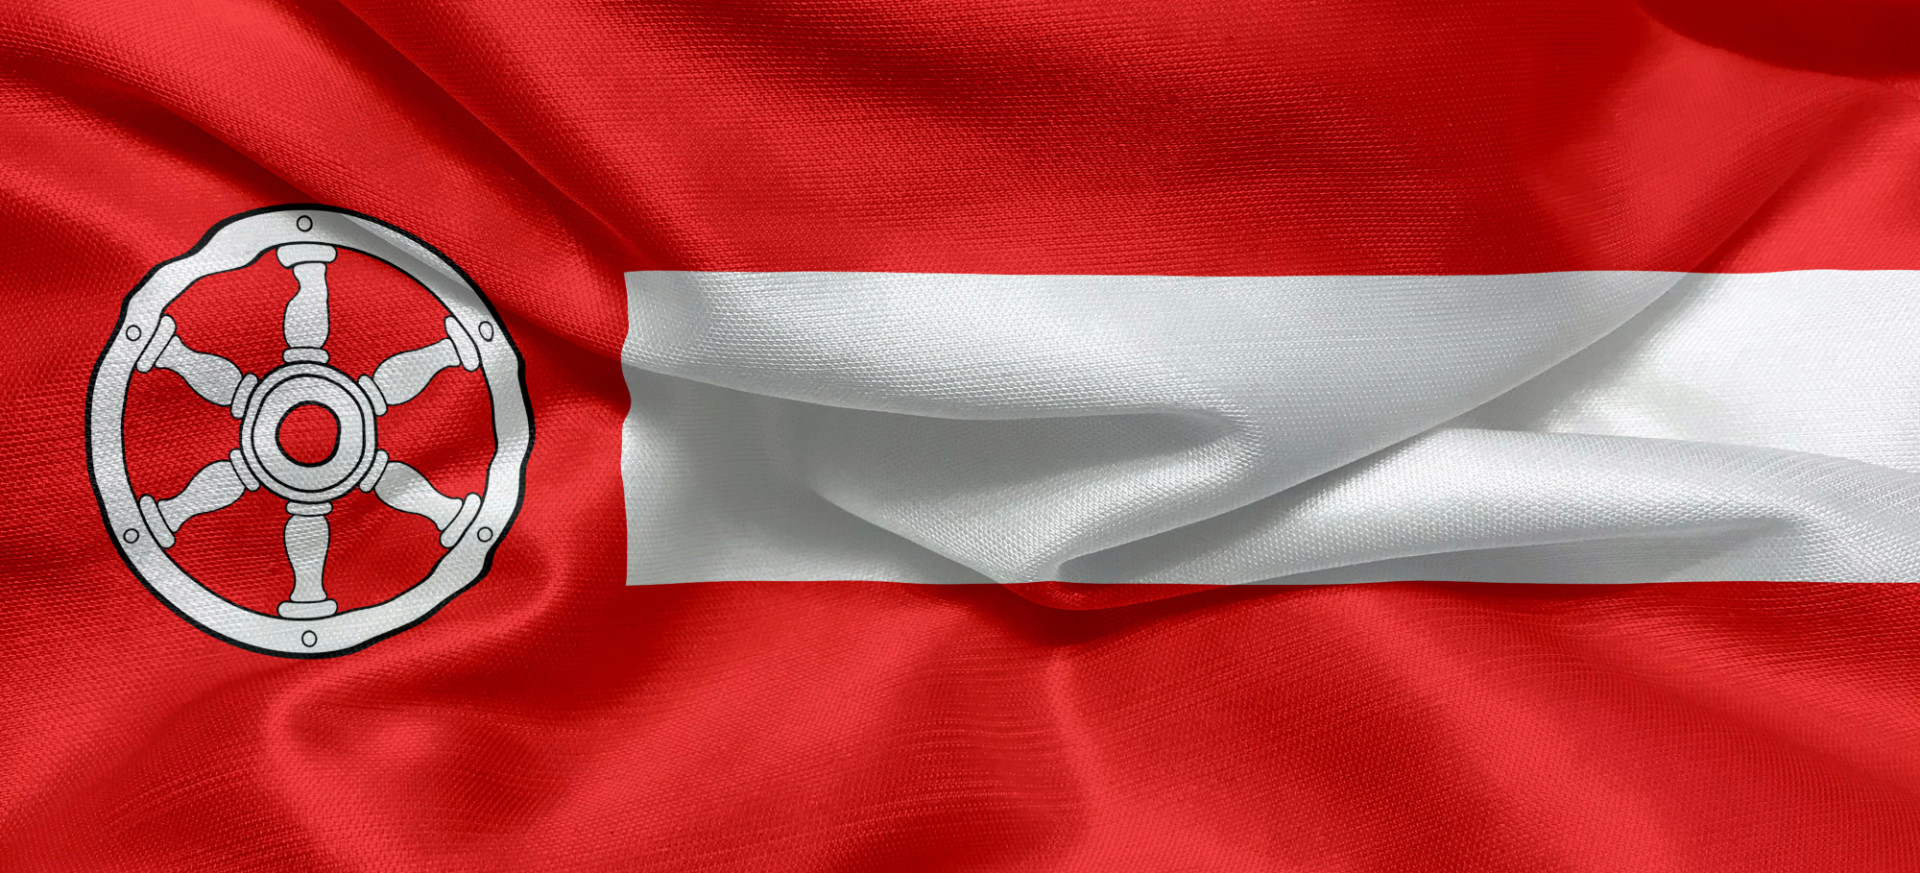 Flag of the german city of Erfurt